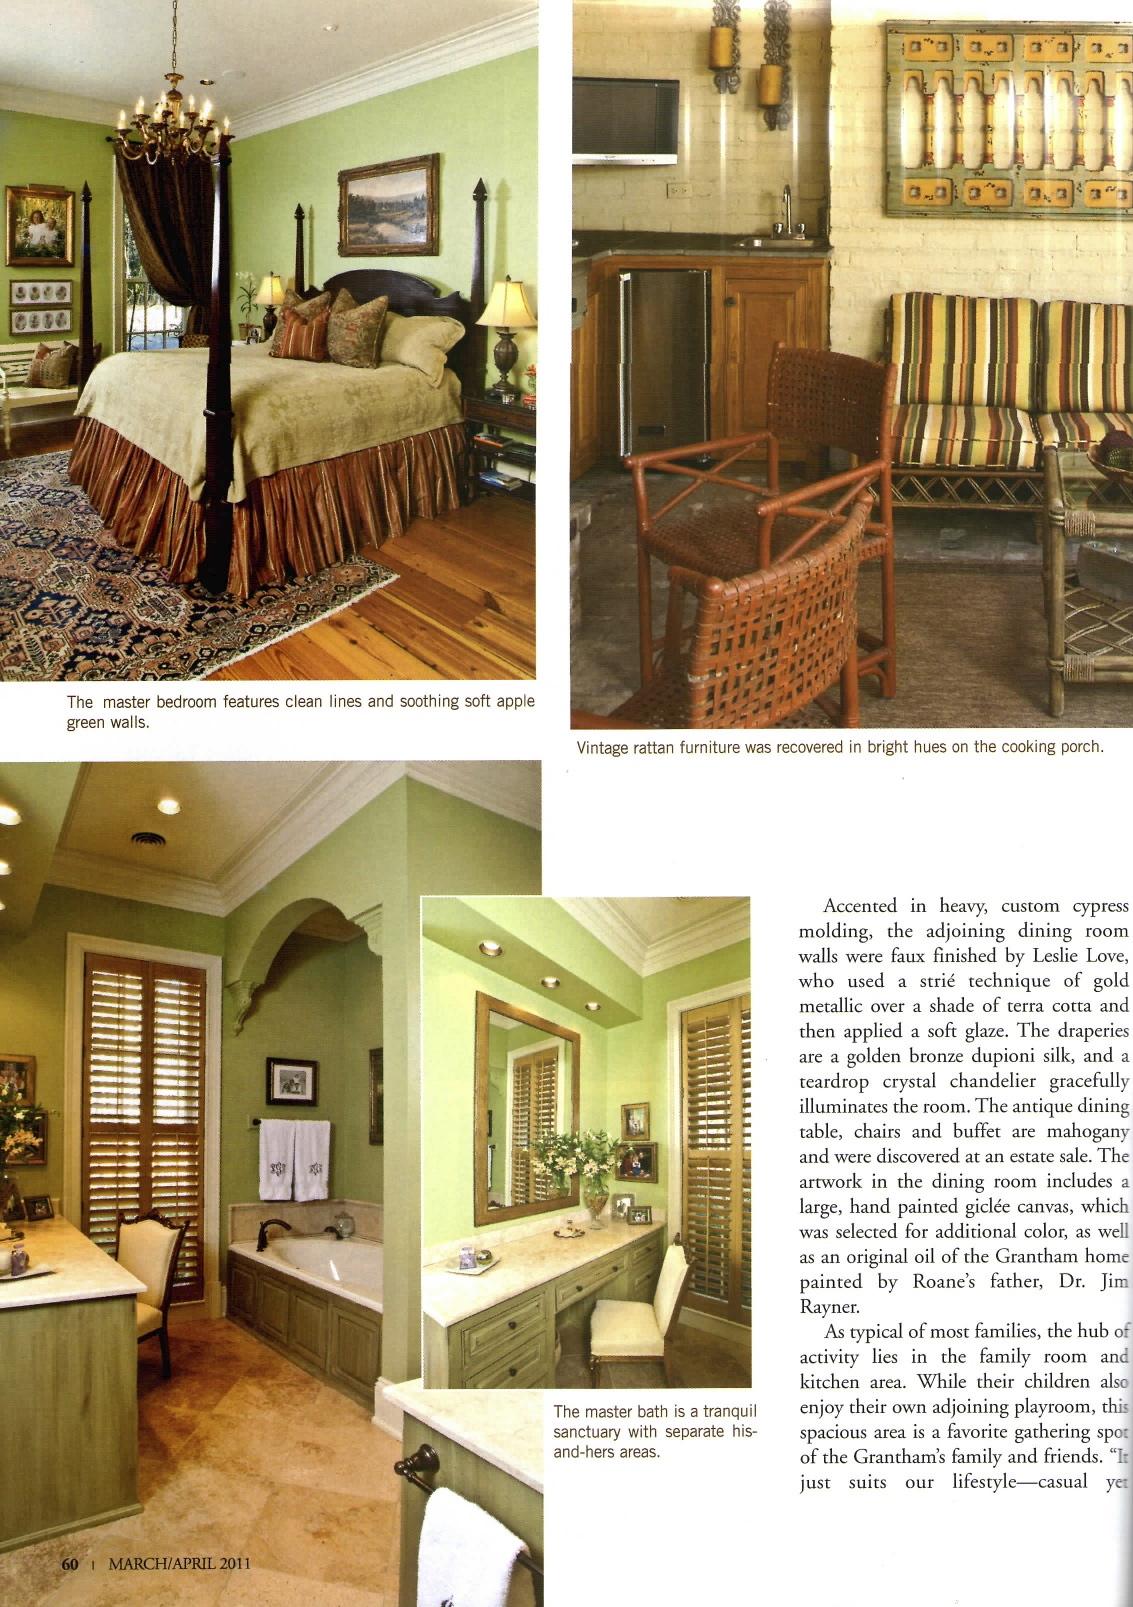 Grantham article - Delta Magazine -March April 2011 7.jpeg